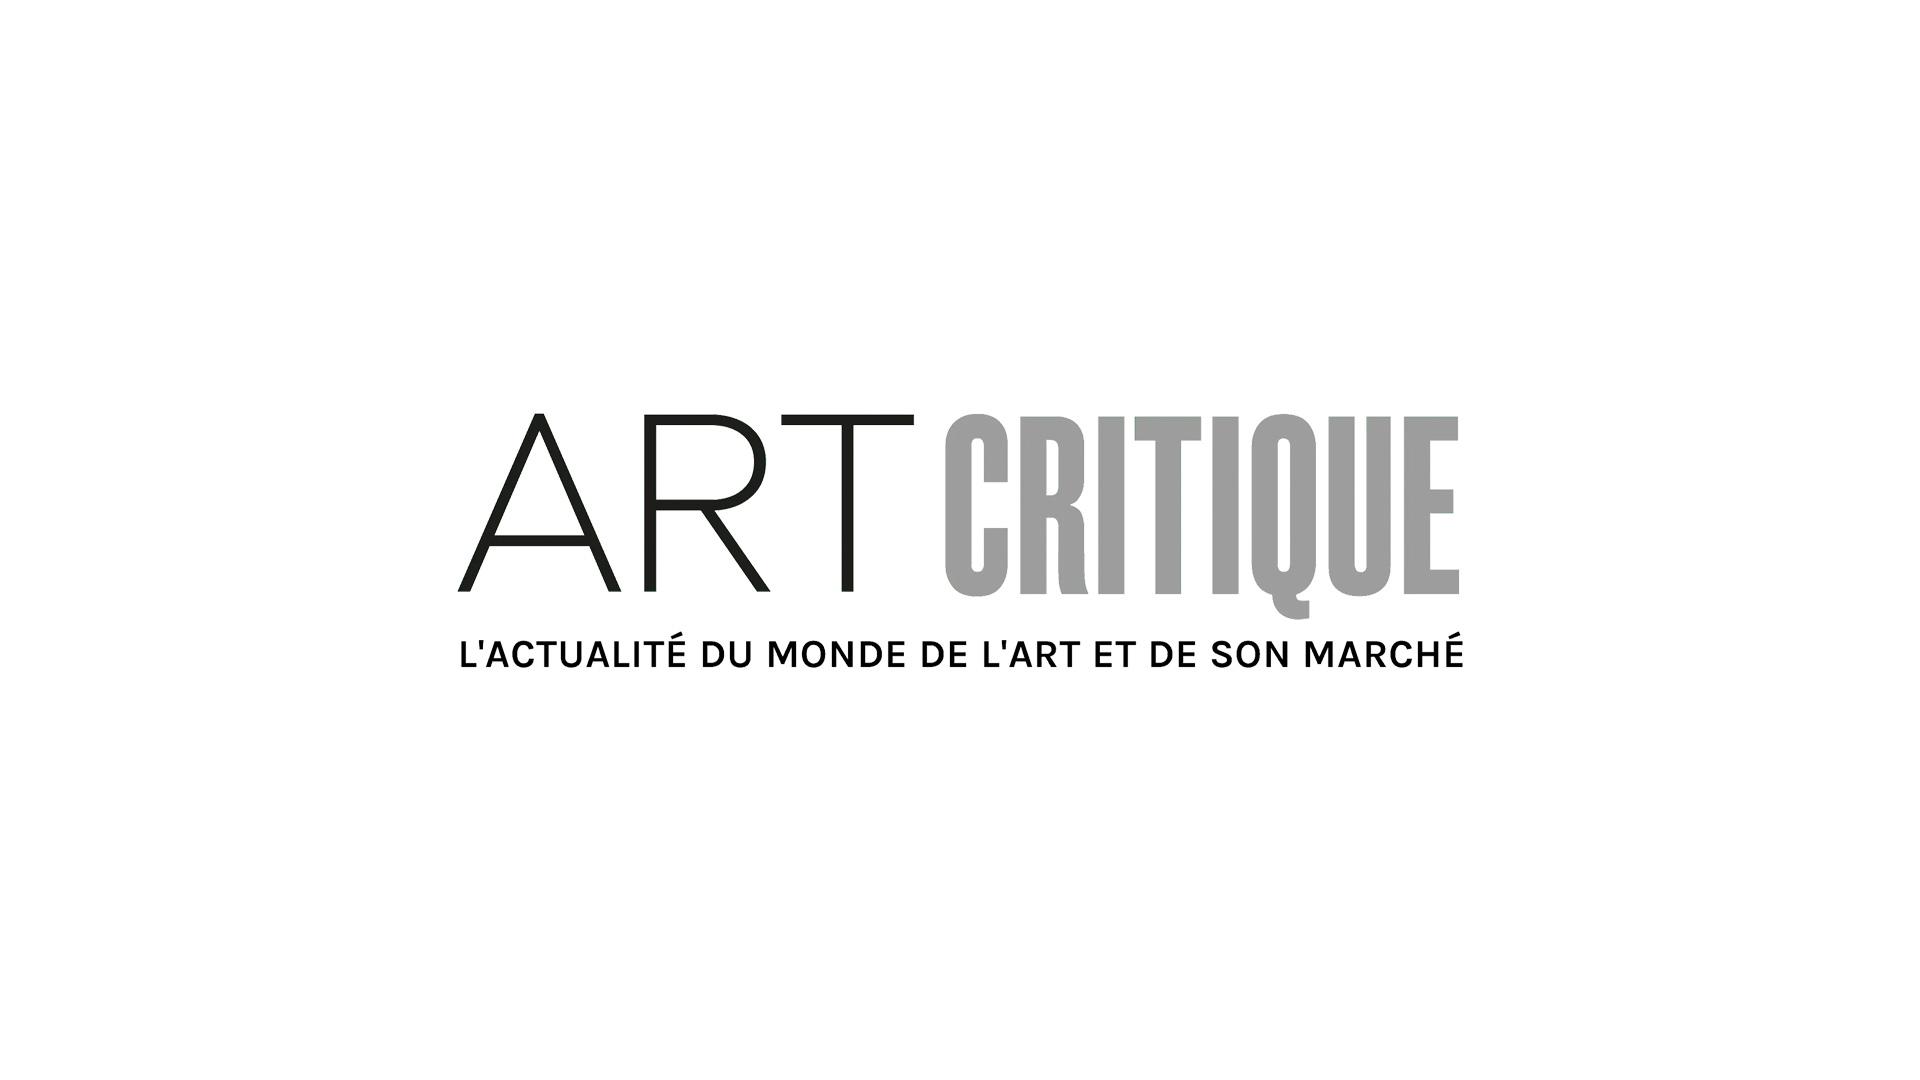 Enchères mirobolantes pour David Hockney